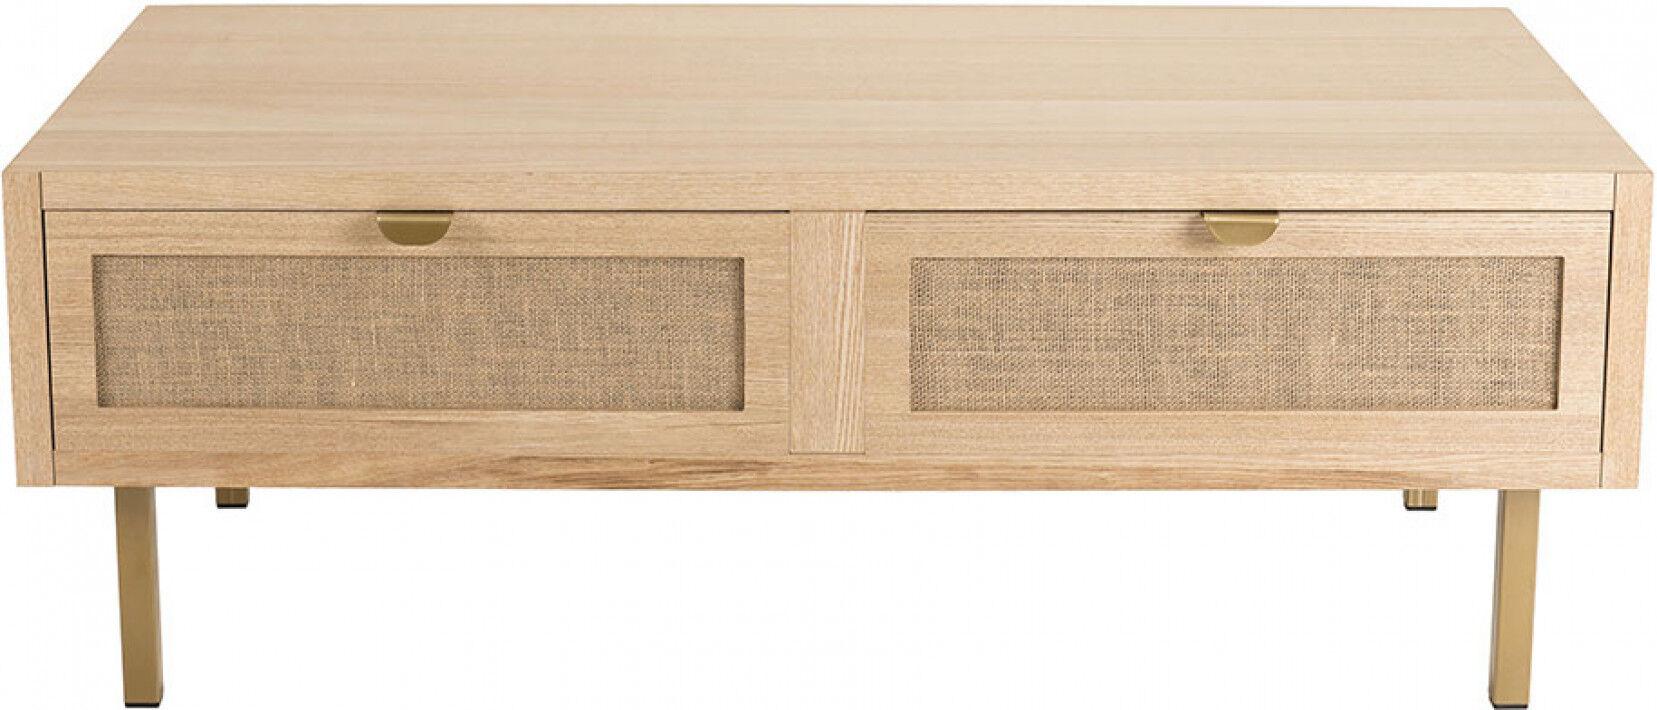 Table basse 2 tiroirs toile de jute – ALY